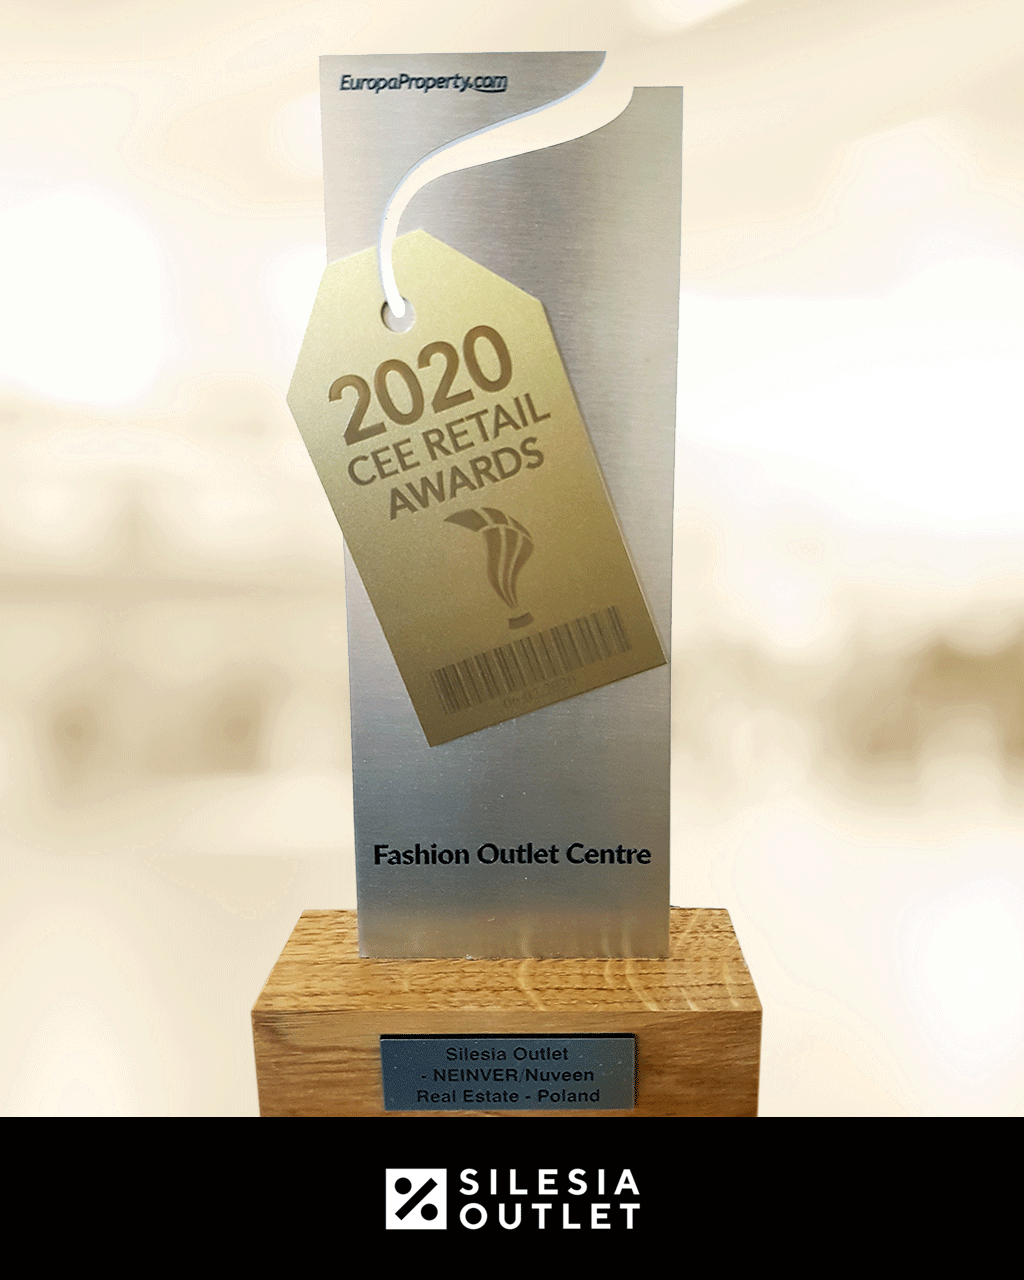 Silesia Outlet award